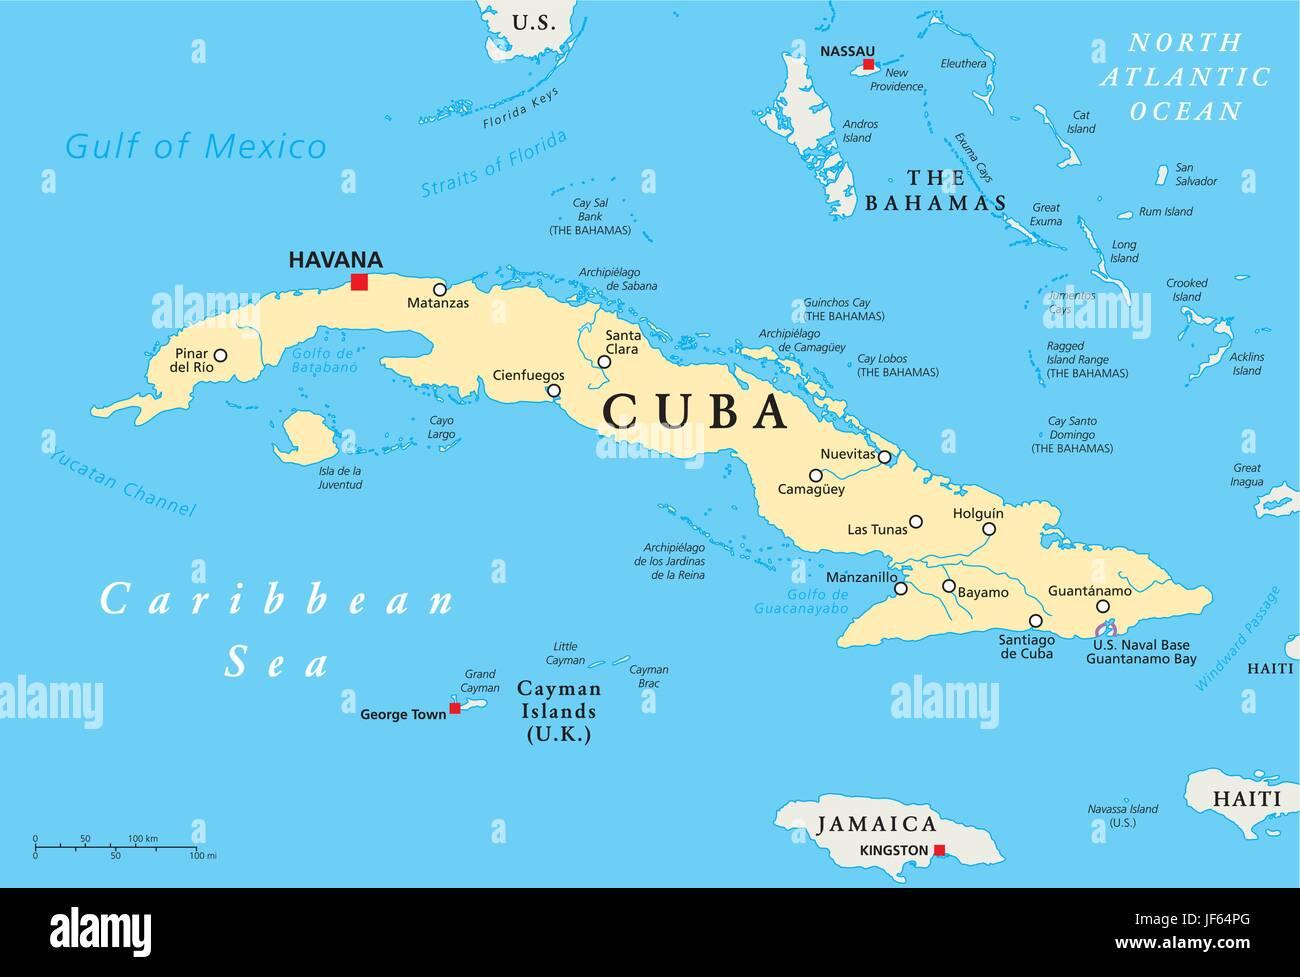 Carte Cuba Monde.Voyages Cuba La Havane Carte Atlas Carte Du Monde